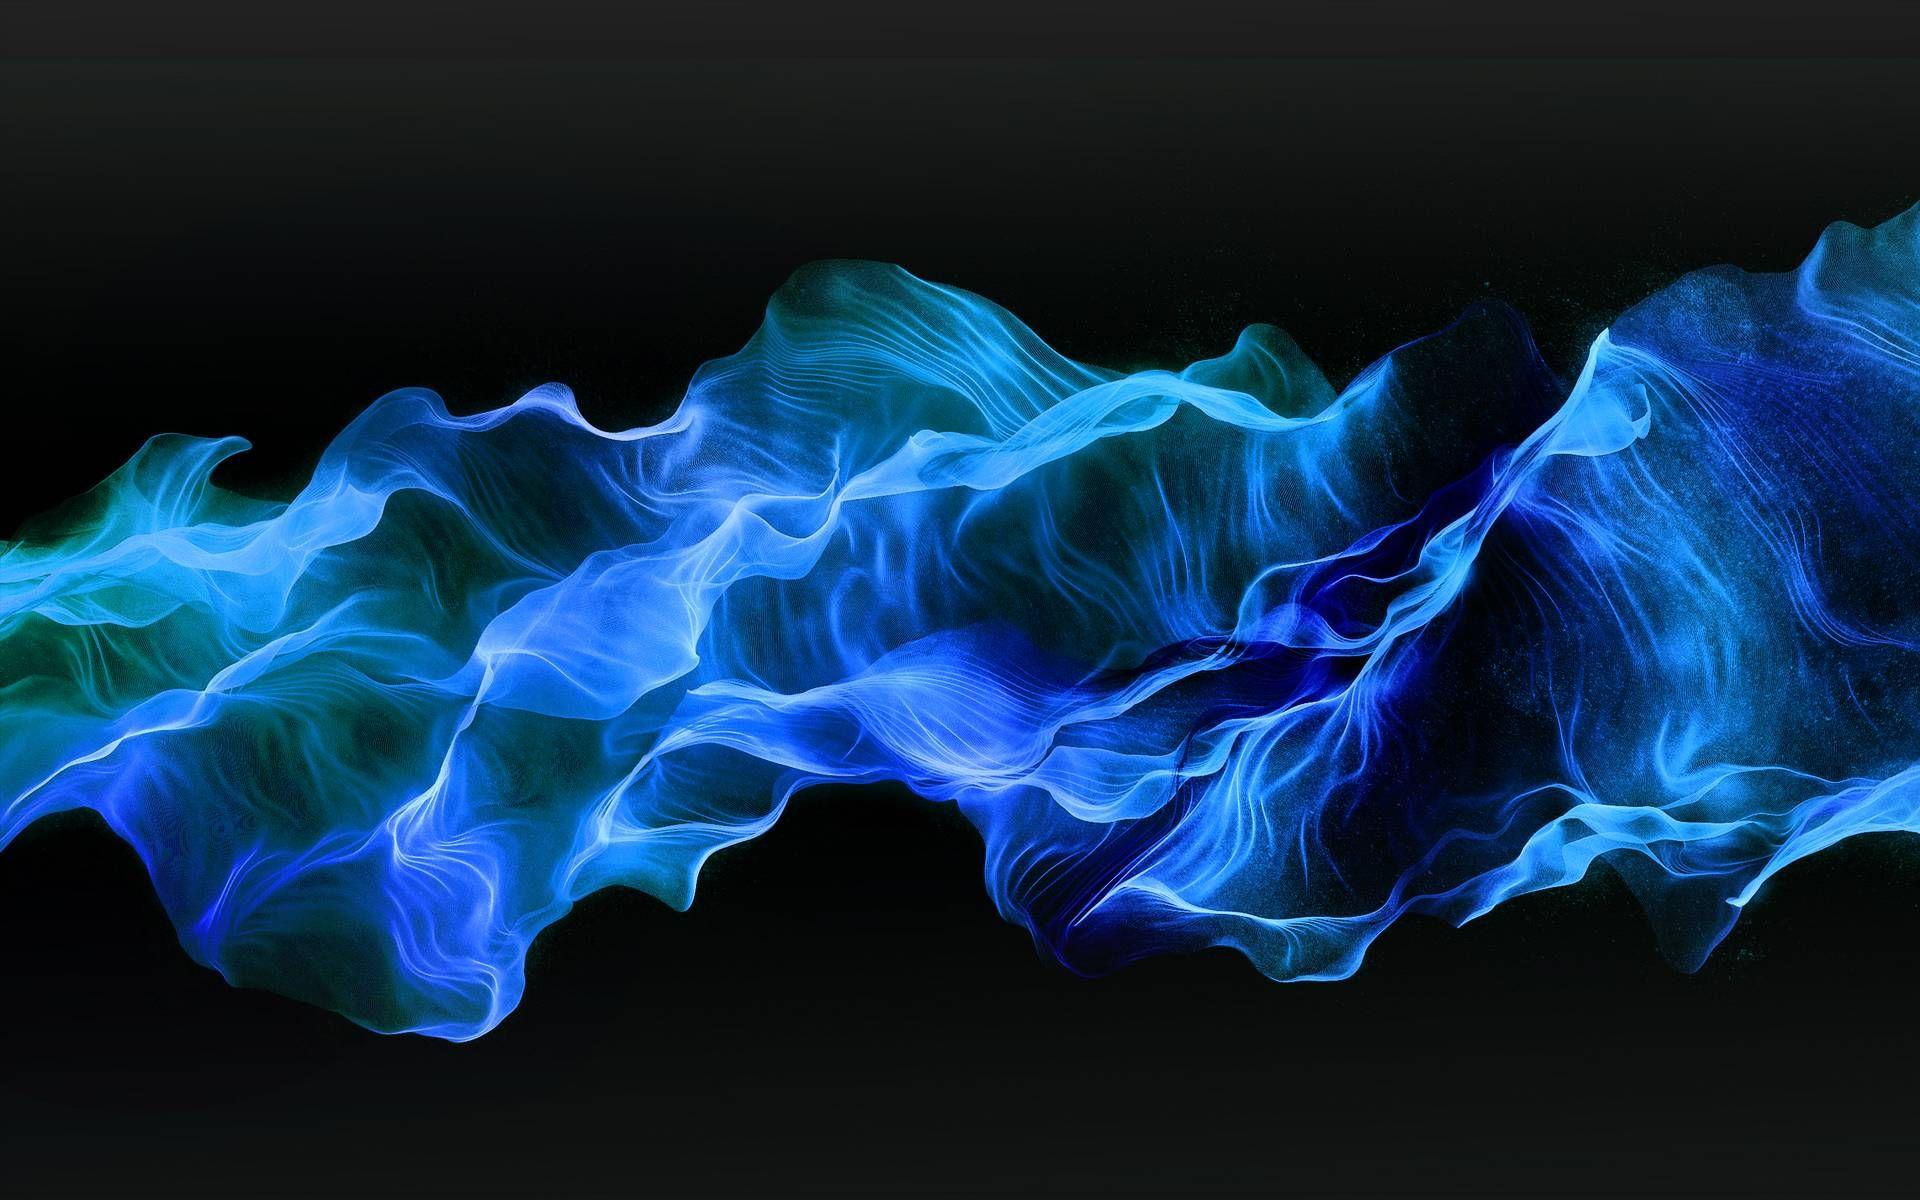 Blue fire wallpaper HD download free.